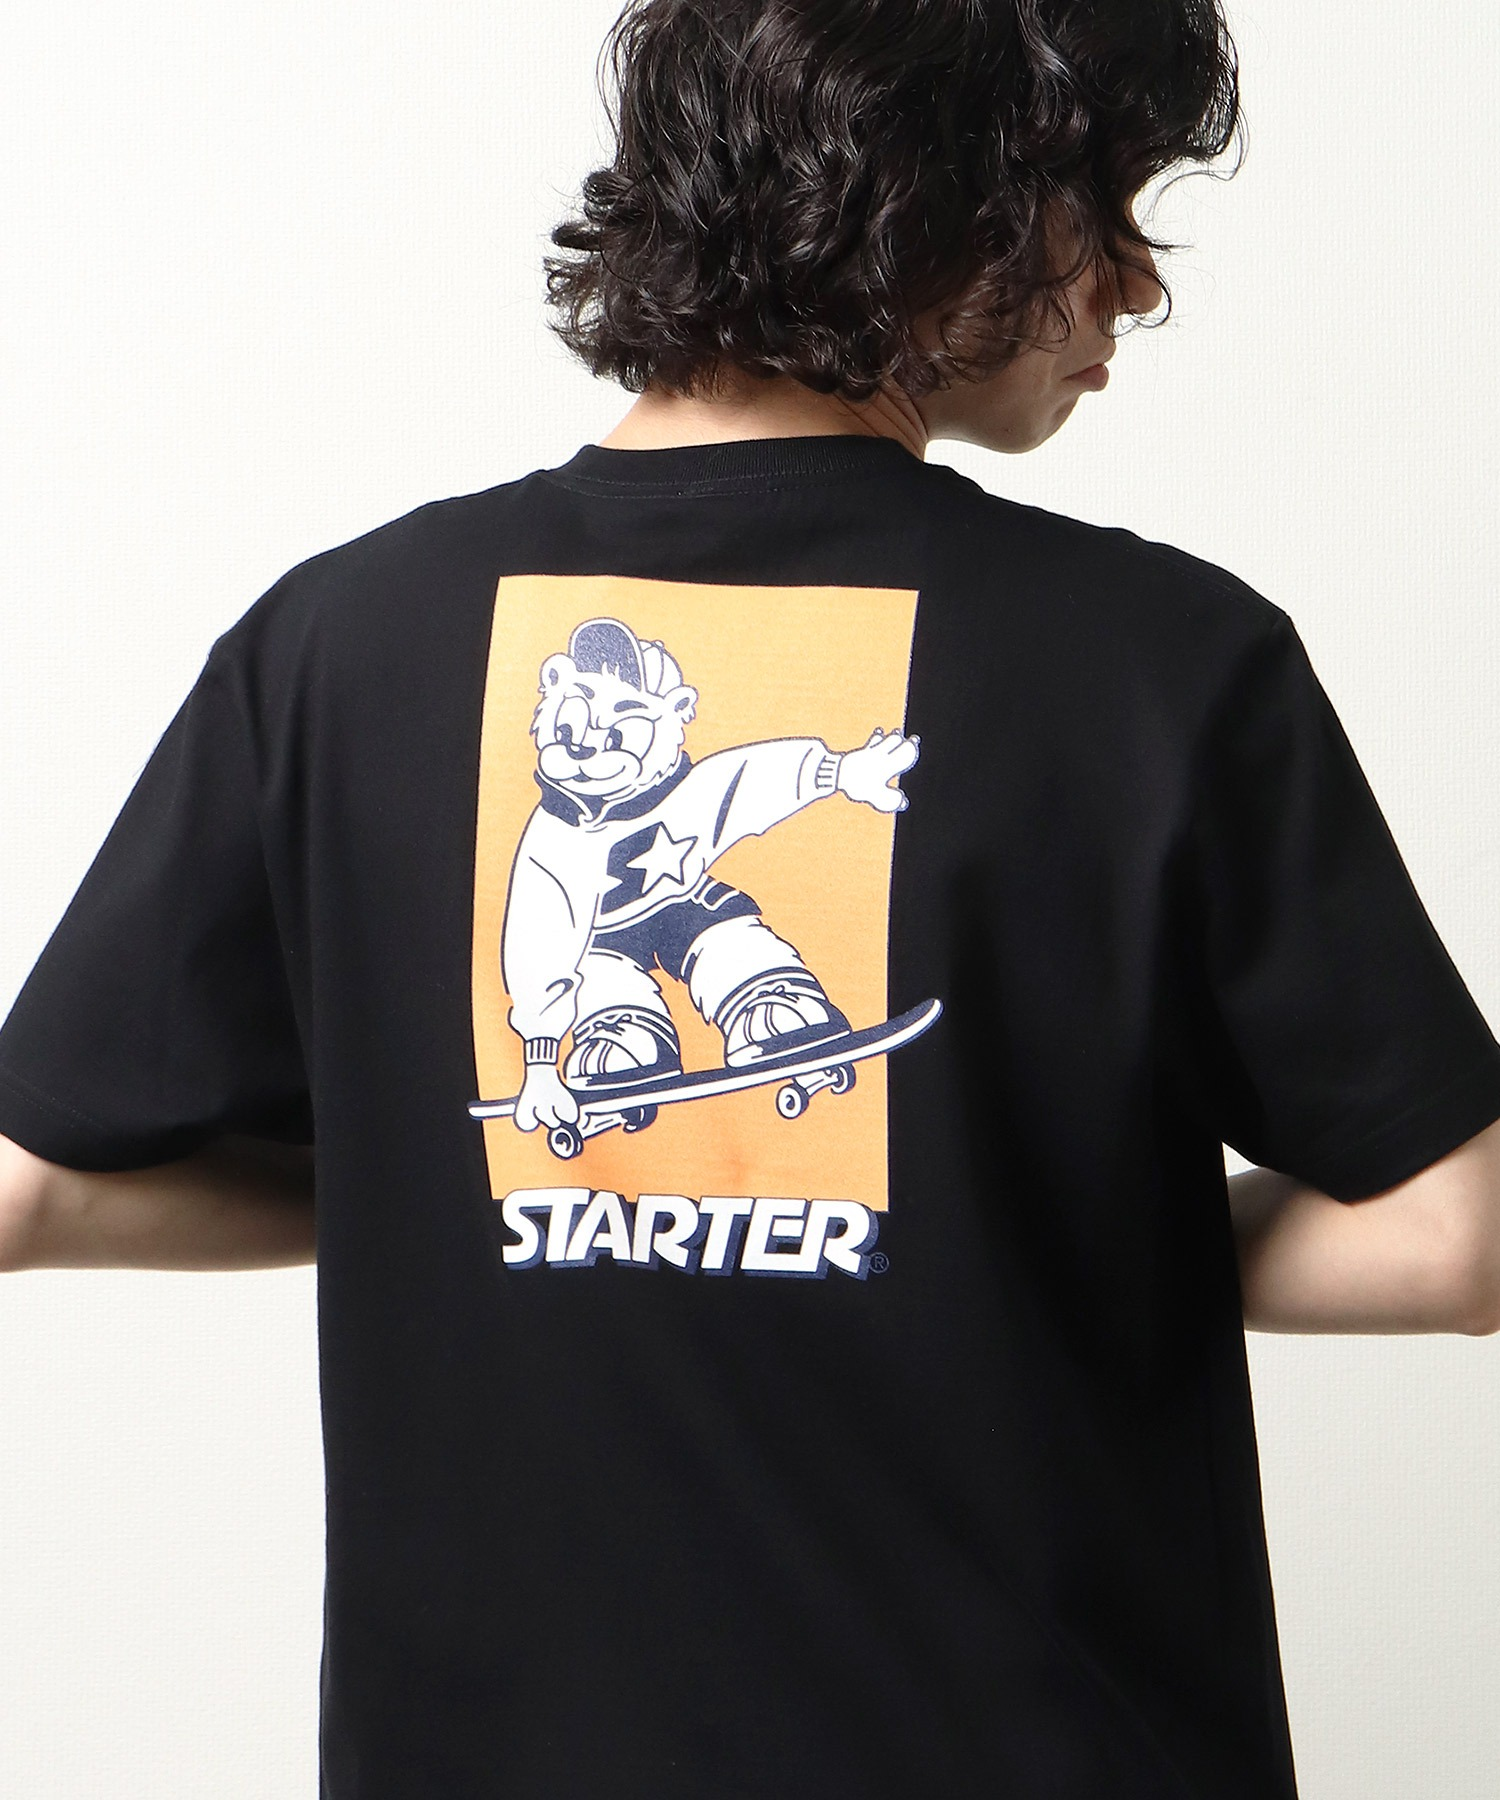 【 STARTER / スターター 】 キャラクターグラフィックTシャツ プリントTシャツ 半袖 X58708J BNU